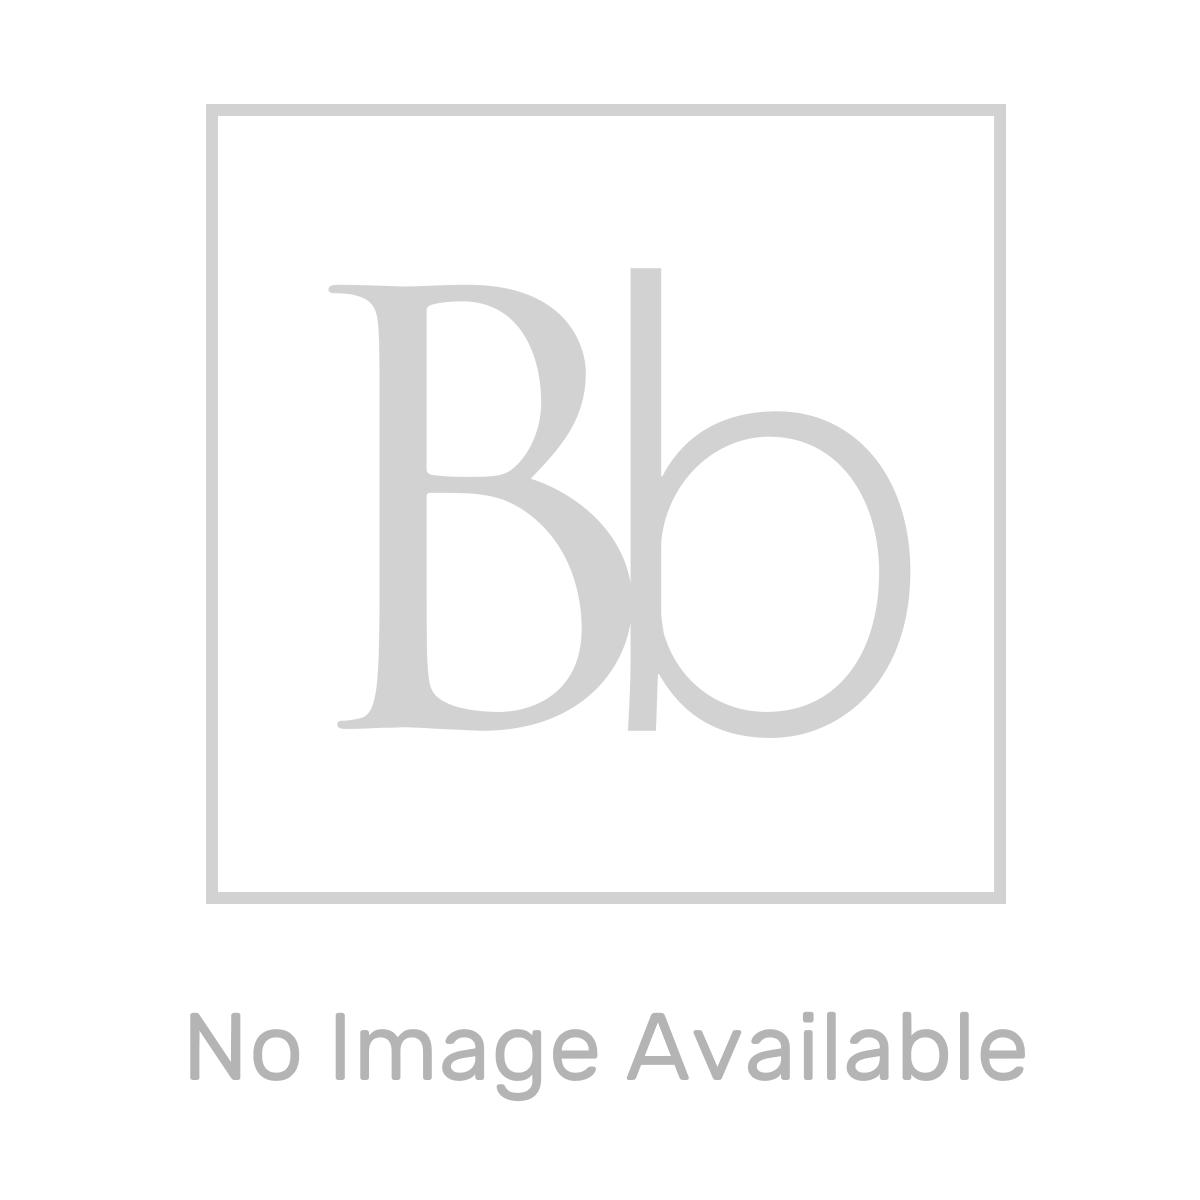 Triton Thames Single Position Vandal Resistant Shower Head